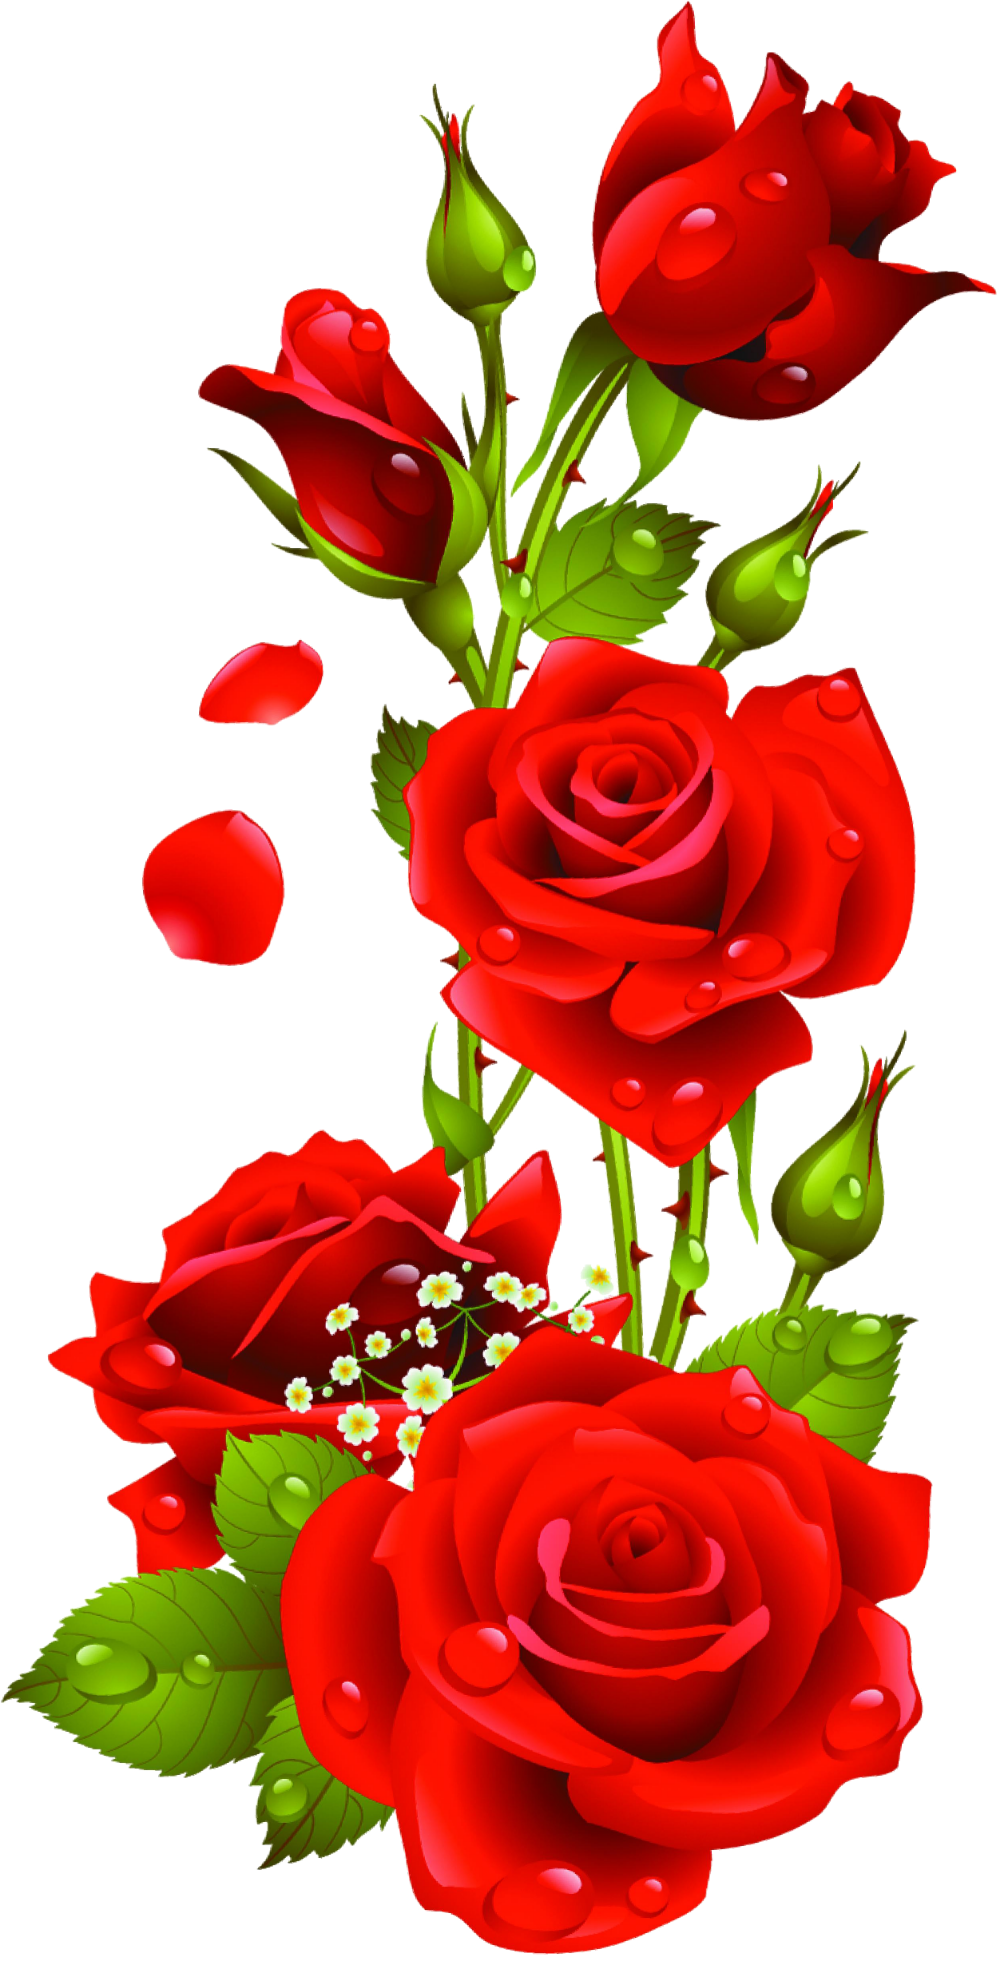 Red Roses Vector Kyrmyzy Gul Png Resimler Png Kyrmyzy Gul Clip Art Library Beautiful Rose Flowers Flower Phone Wallpaper Rose Flower Wallpaper